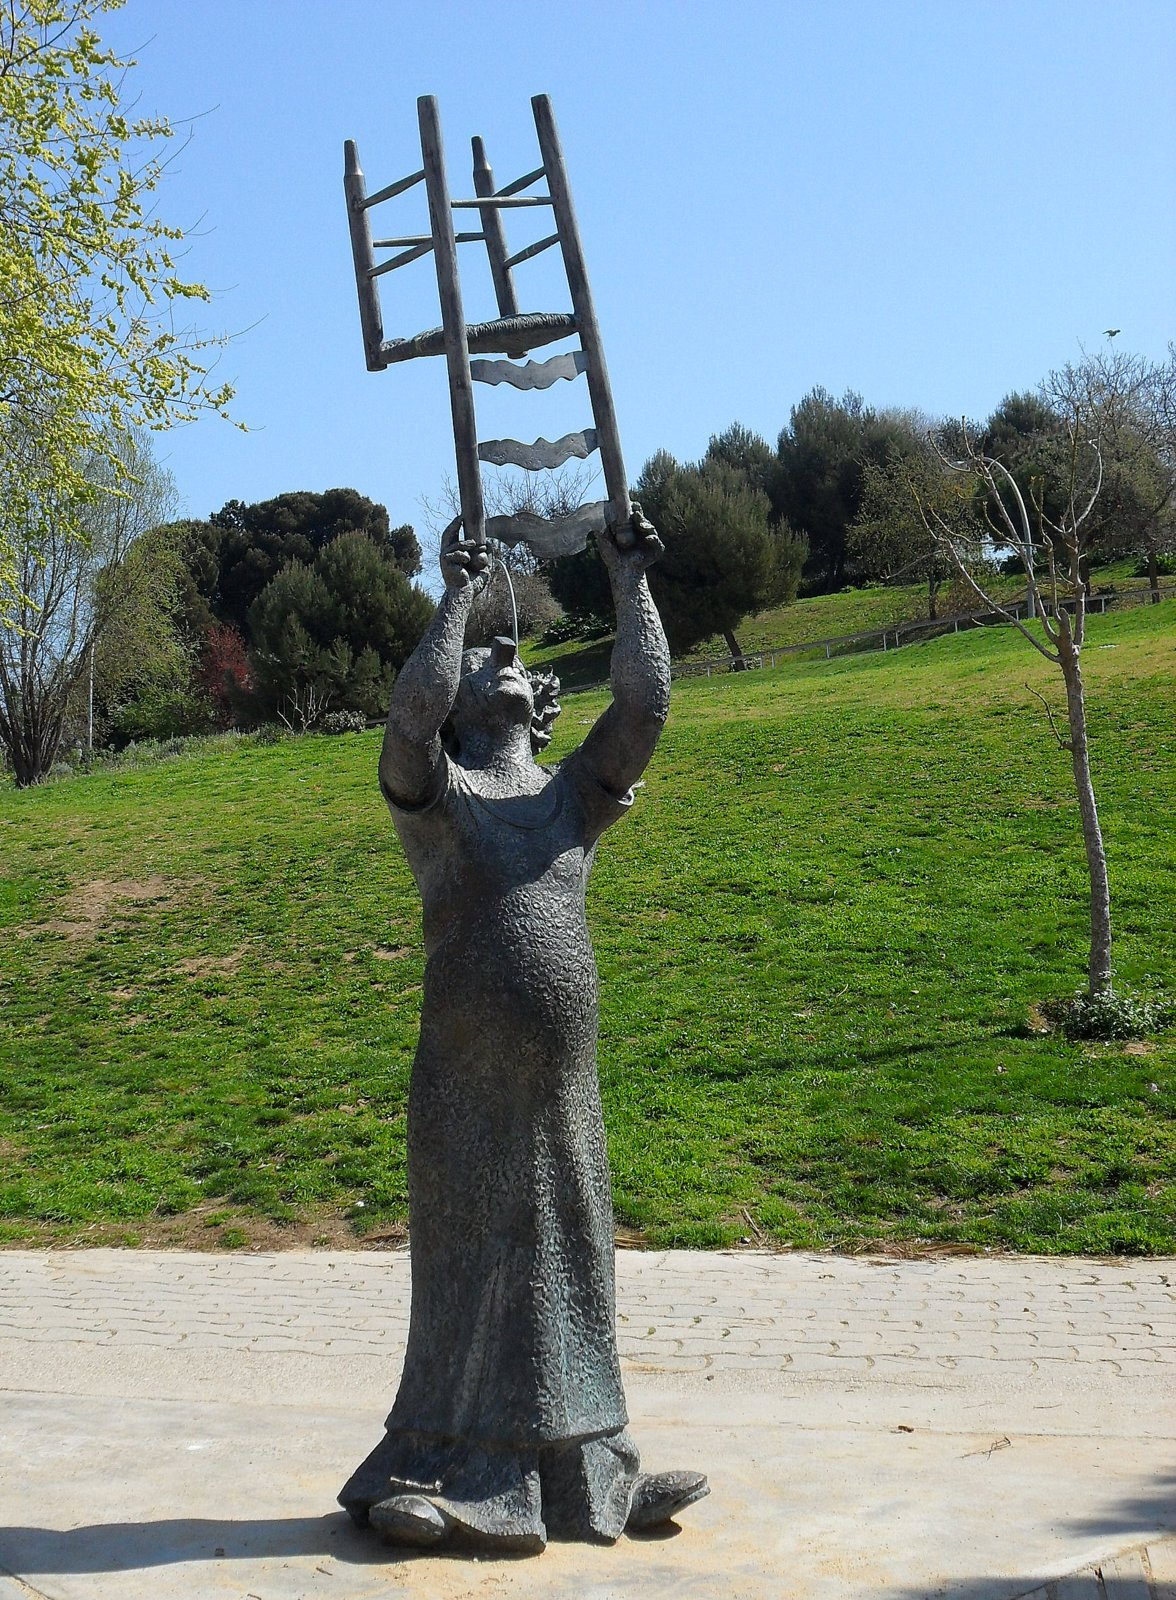 Guia mon ra mon barcelona jardins joan brossa i mirador for Jardines de joan brossa